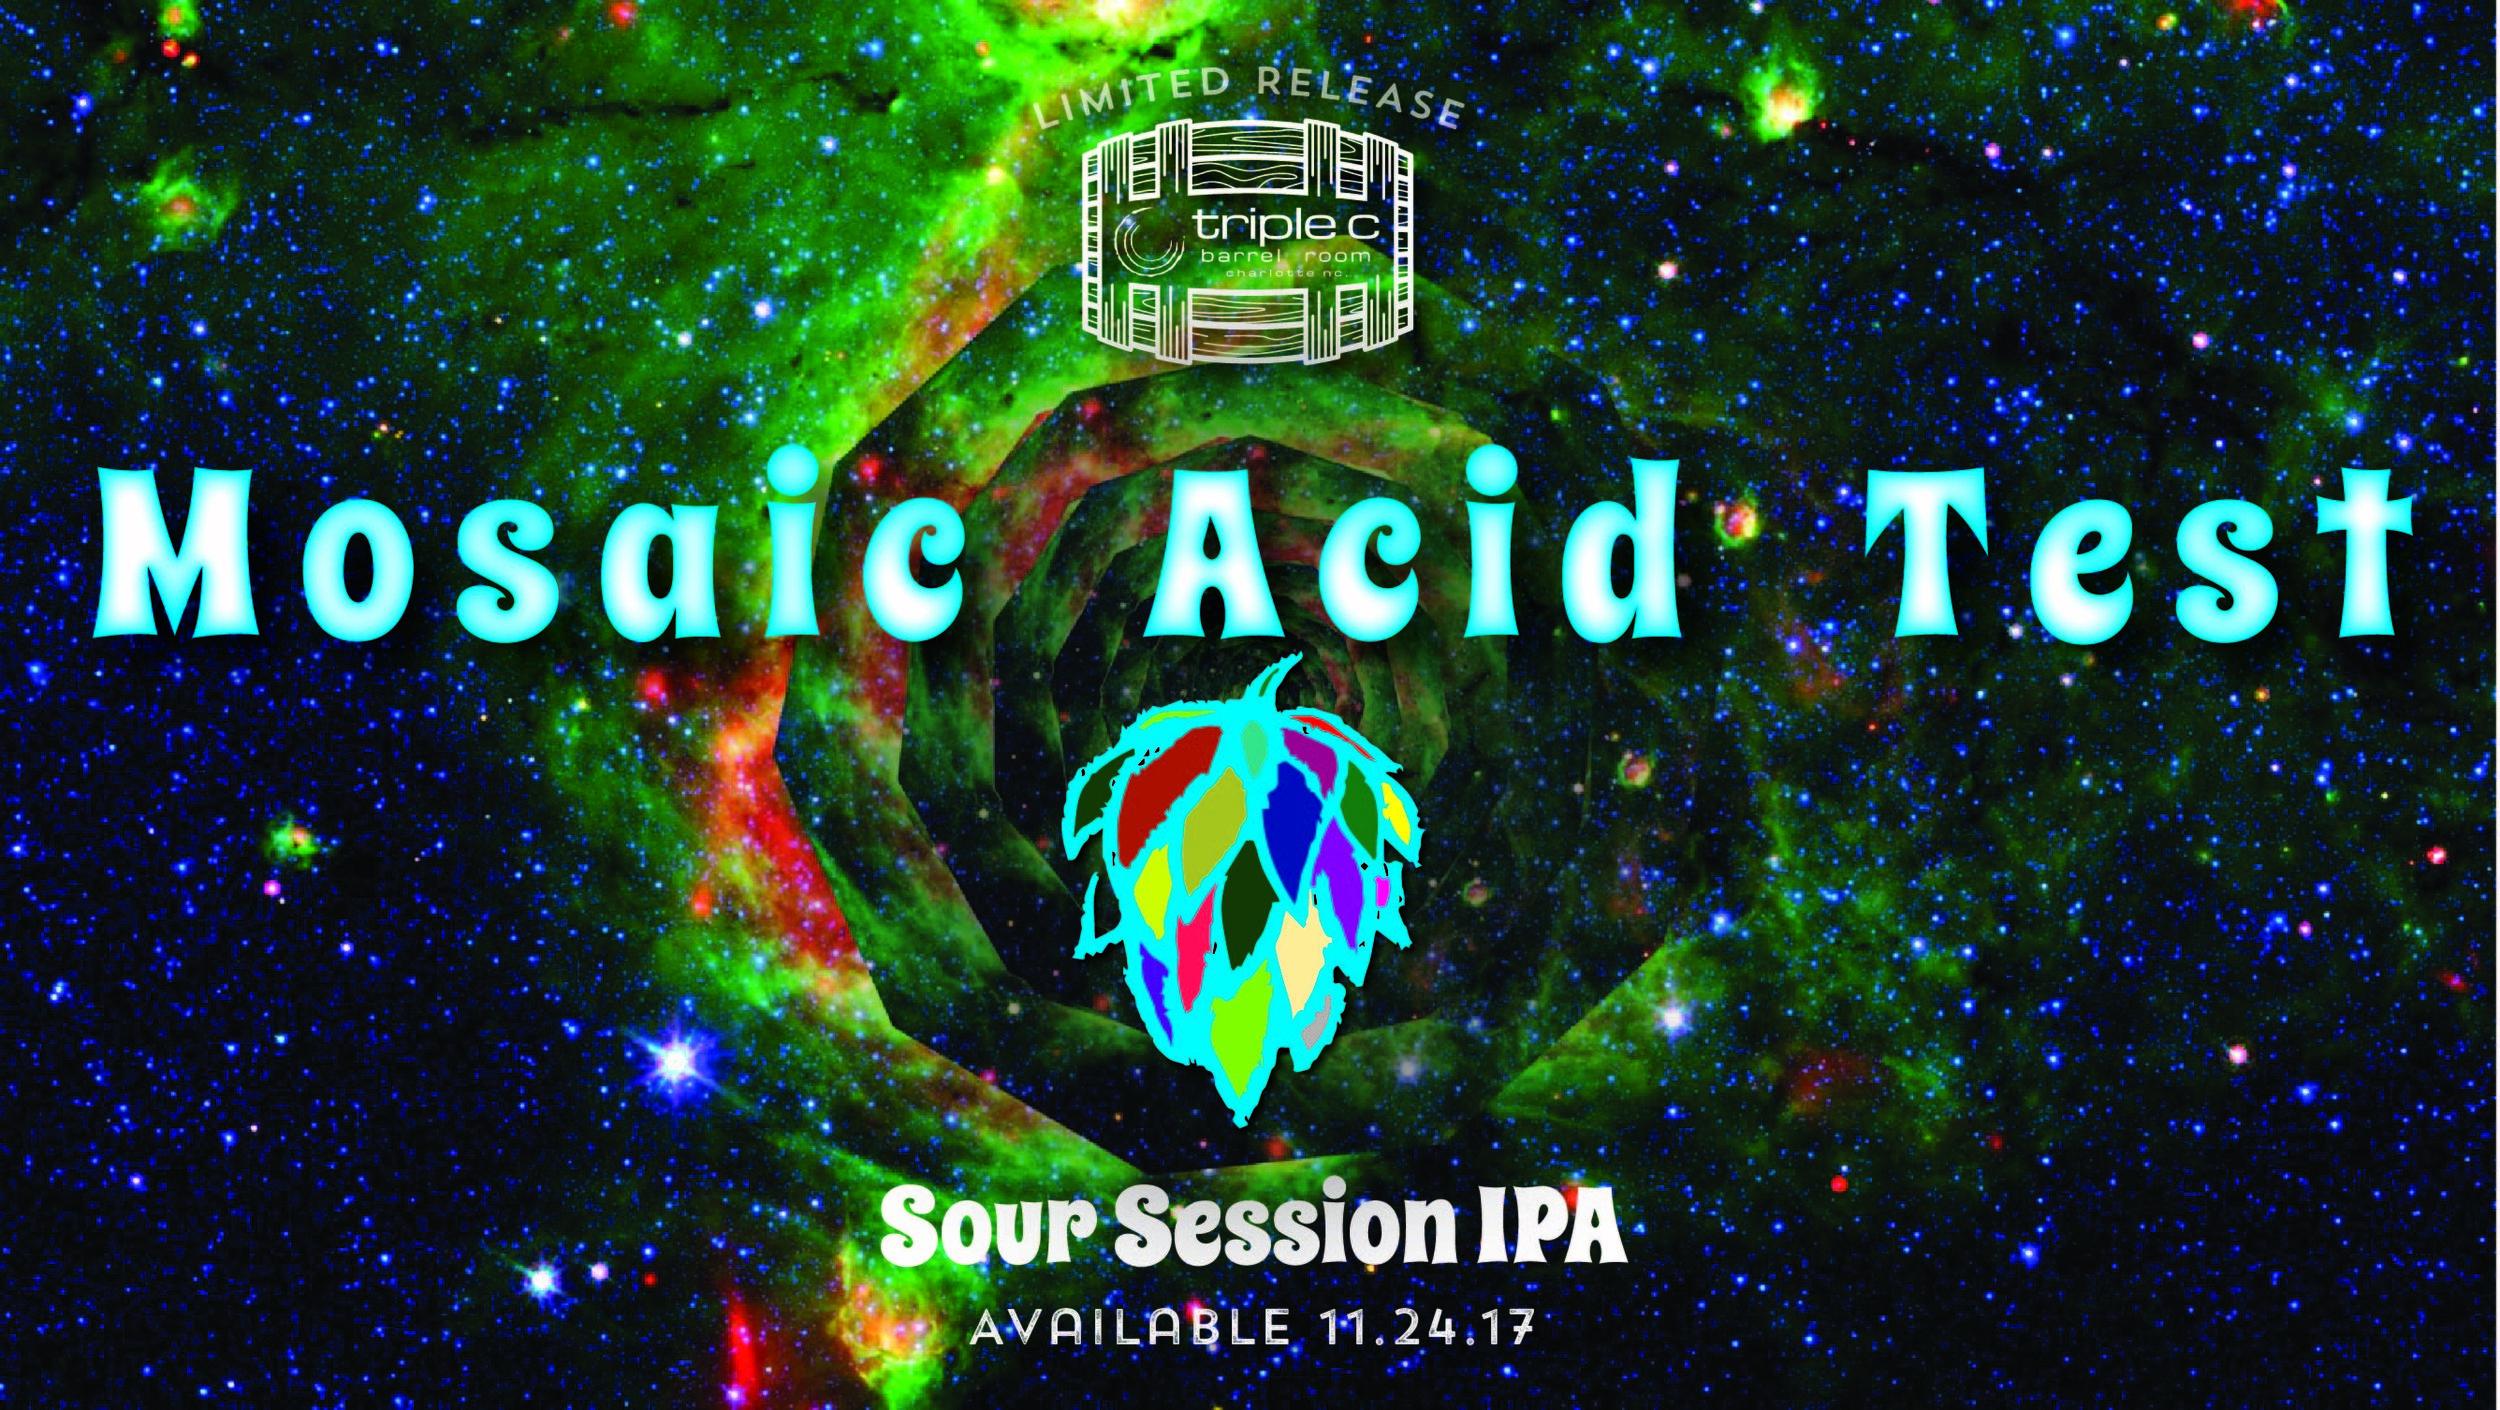 Mosaic_Acid_Test_fb.jpg